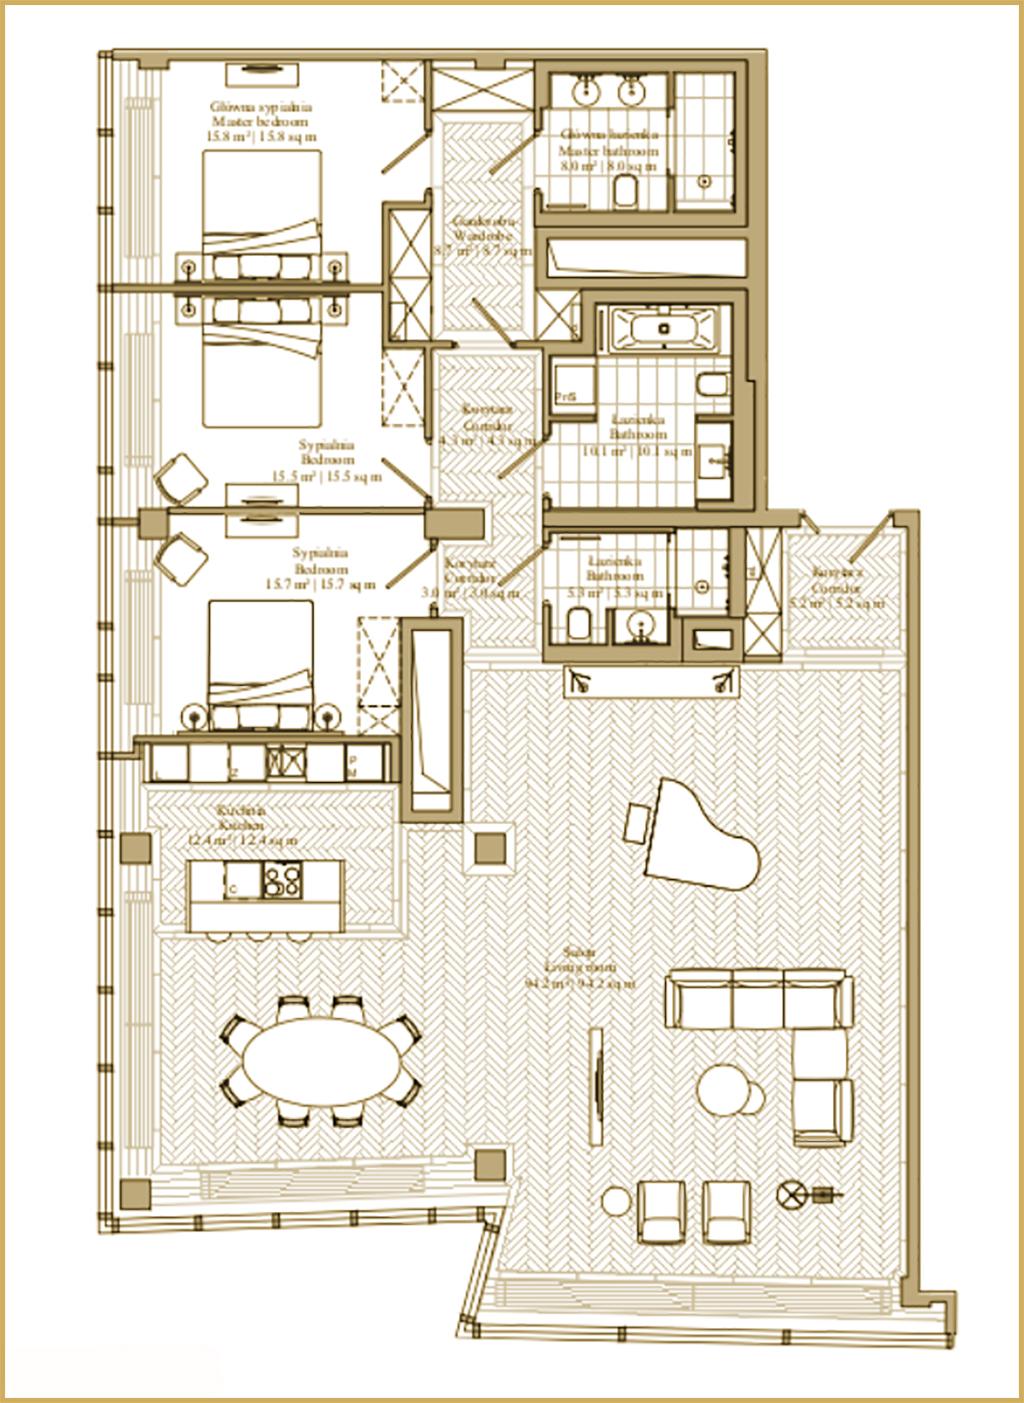 Apartament Kooku - The Signature Apartment